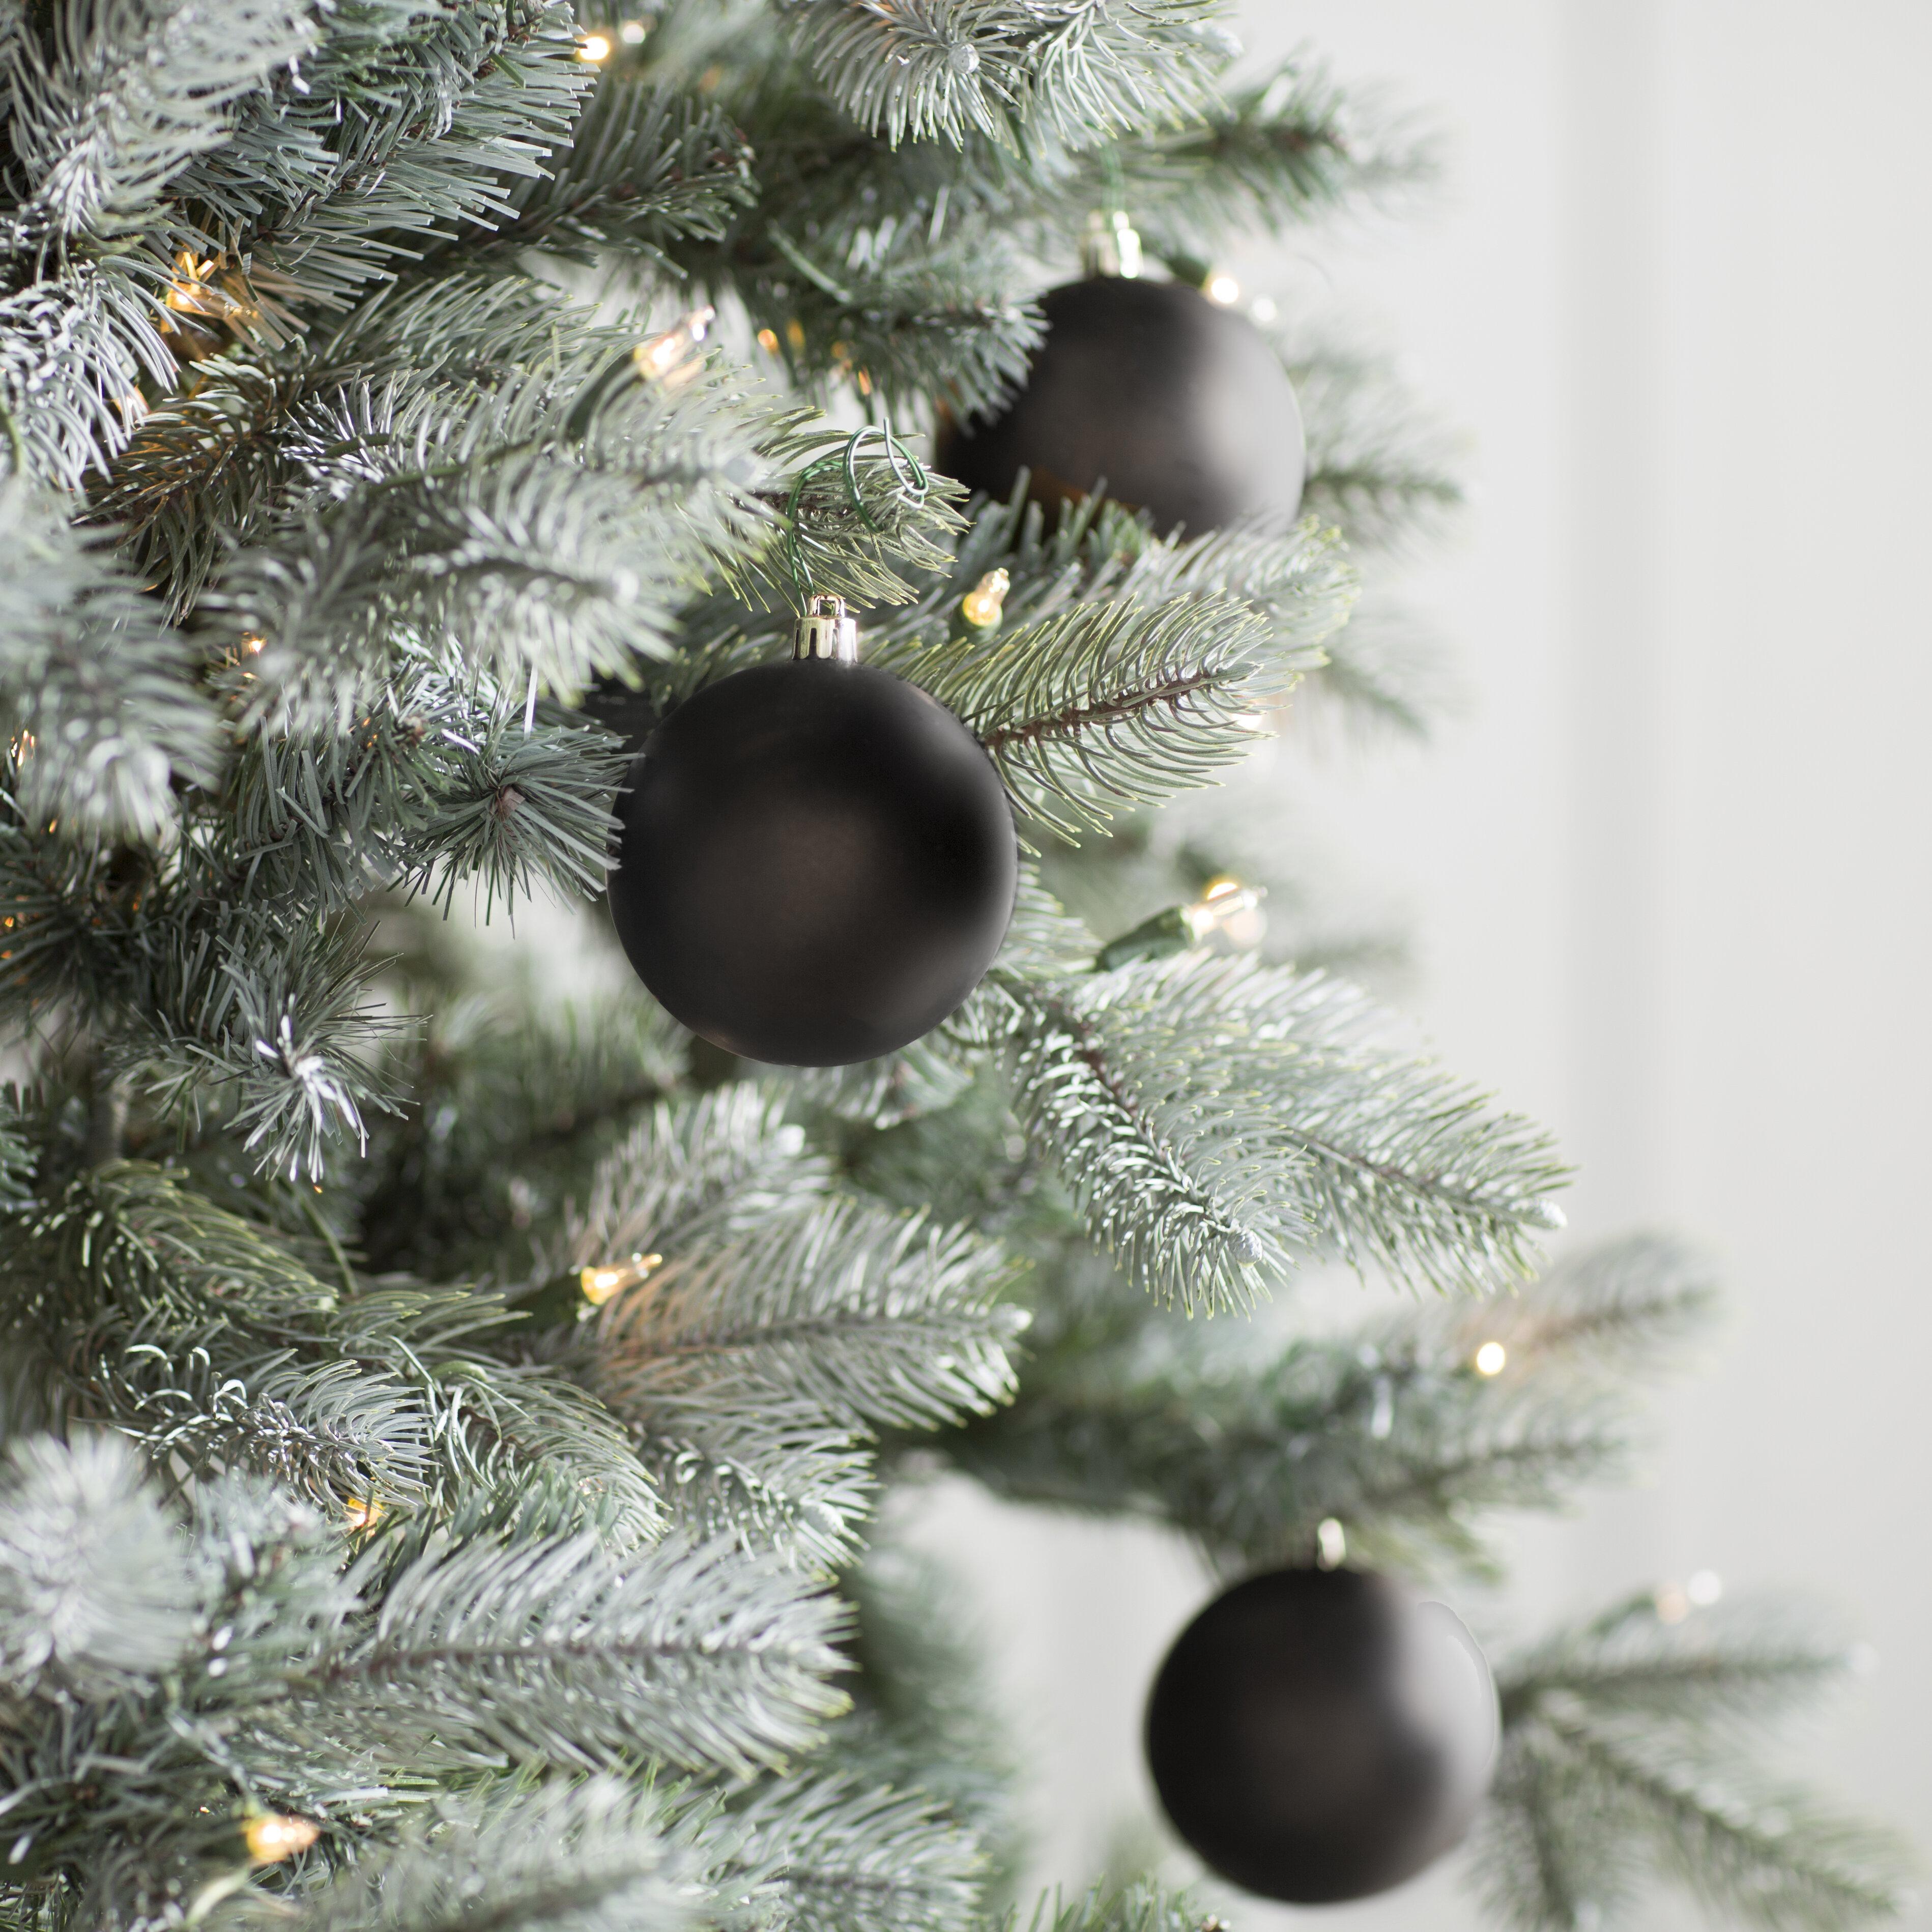 Black Christmas Ornaments You Ll Love In 2021 Wayfair